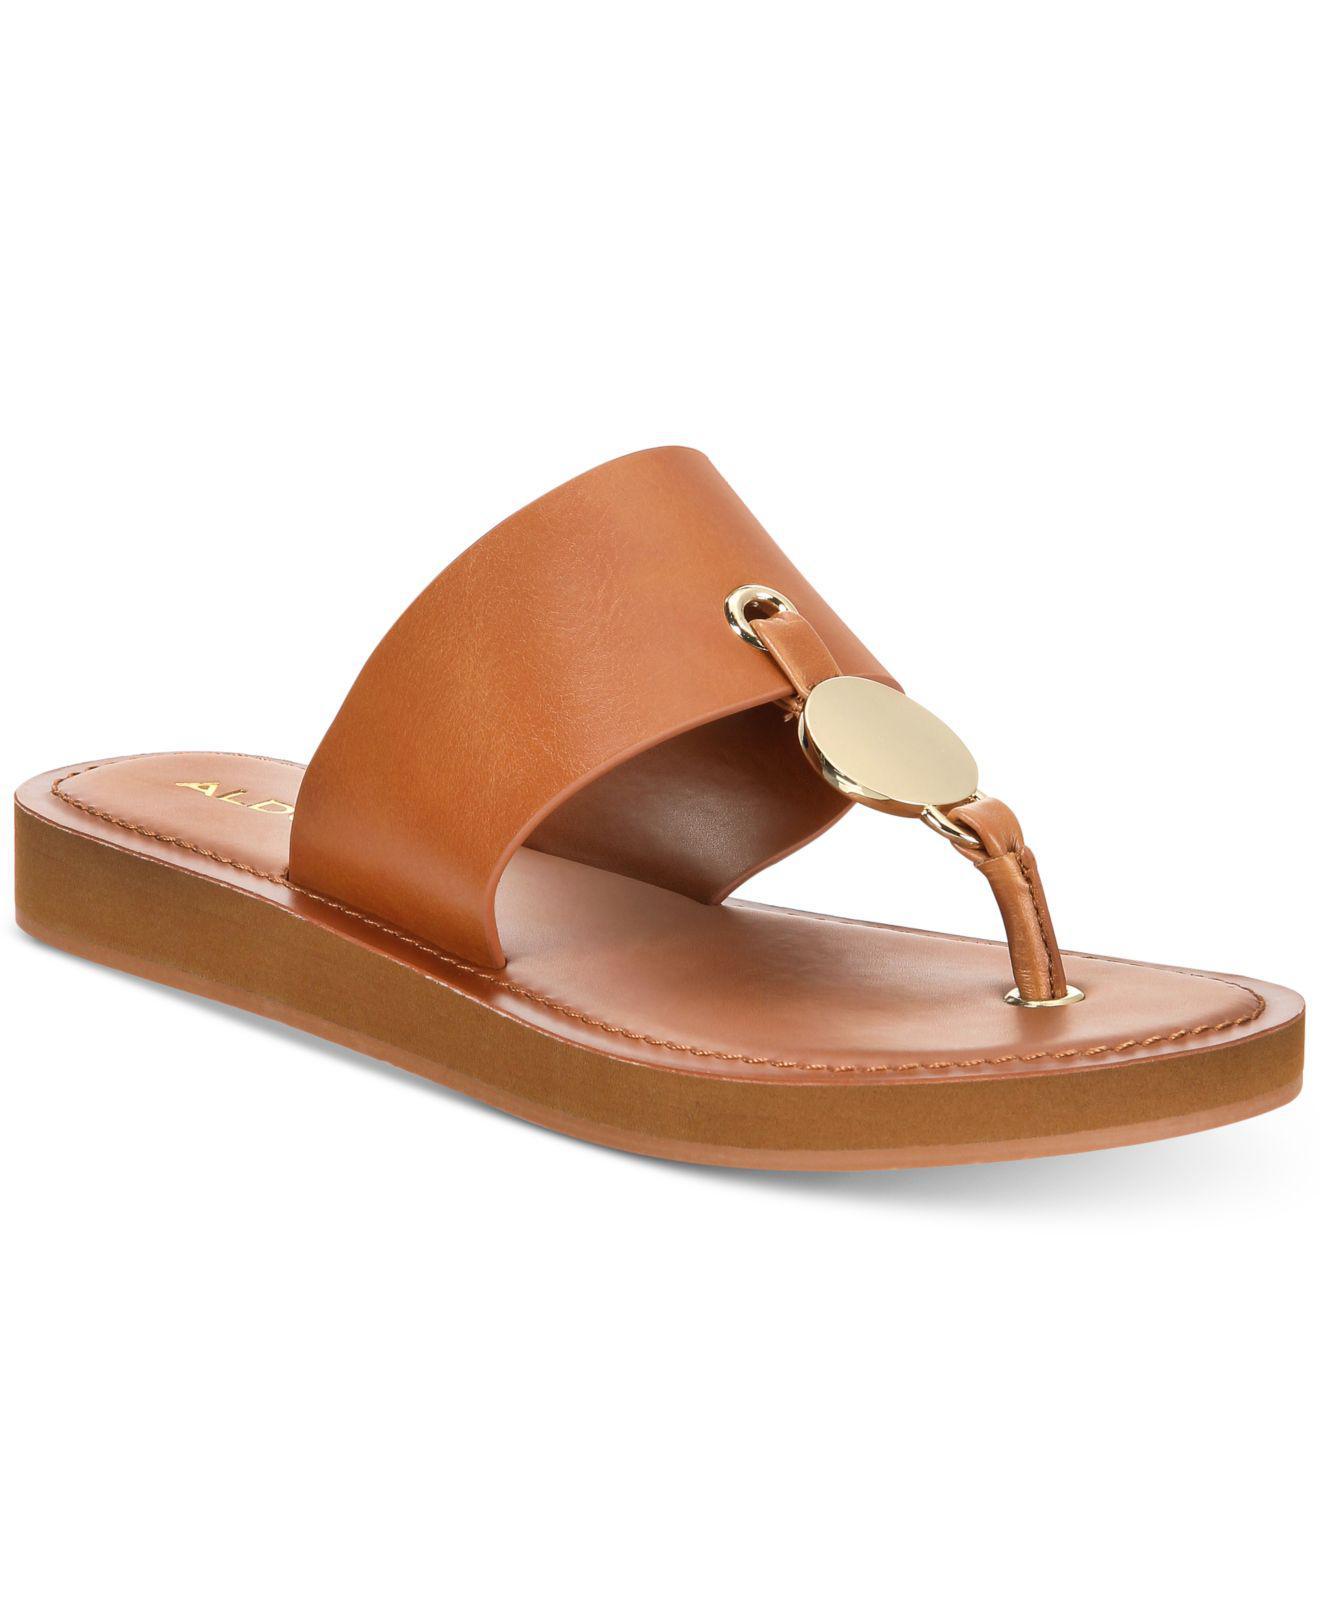 371f68752e8d38 Lyst - ALDO Yilania Coin Slide Sandals in Brown